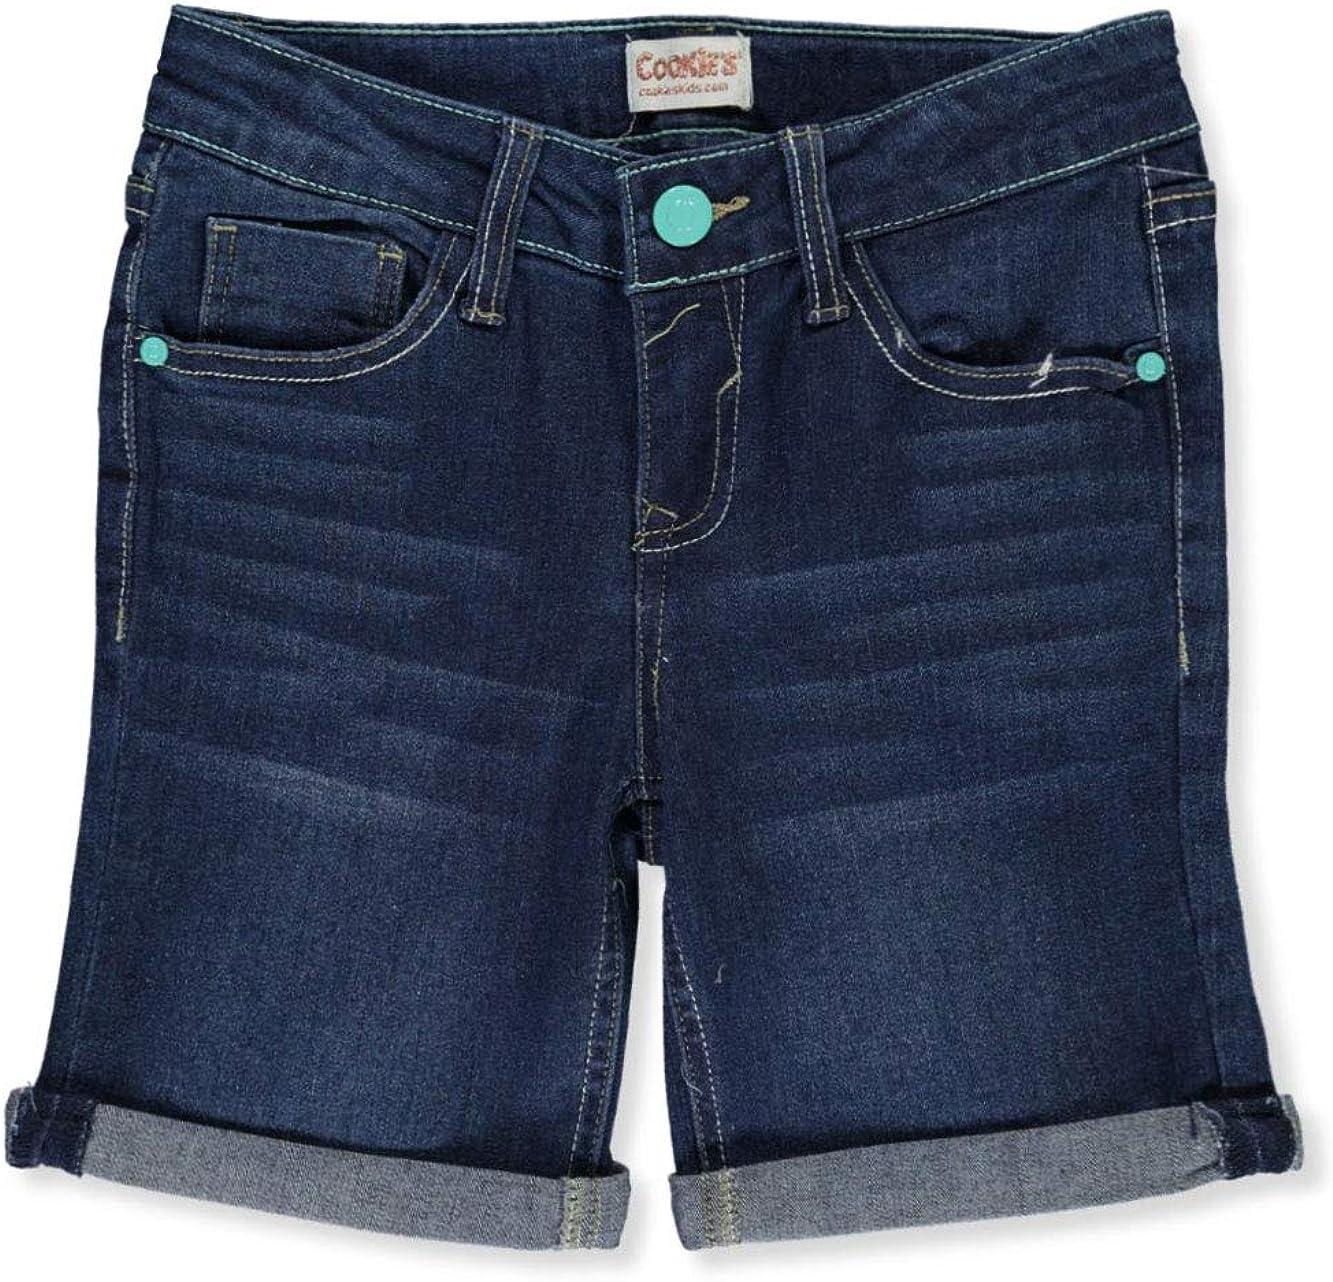 Cookies Brand Girls Bermuda Jean Shorts